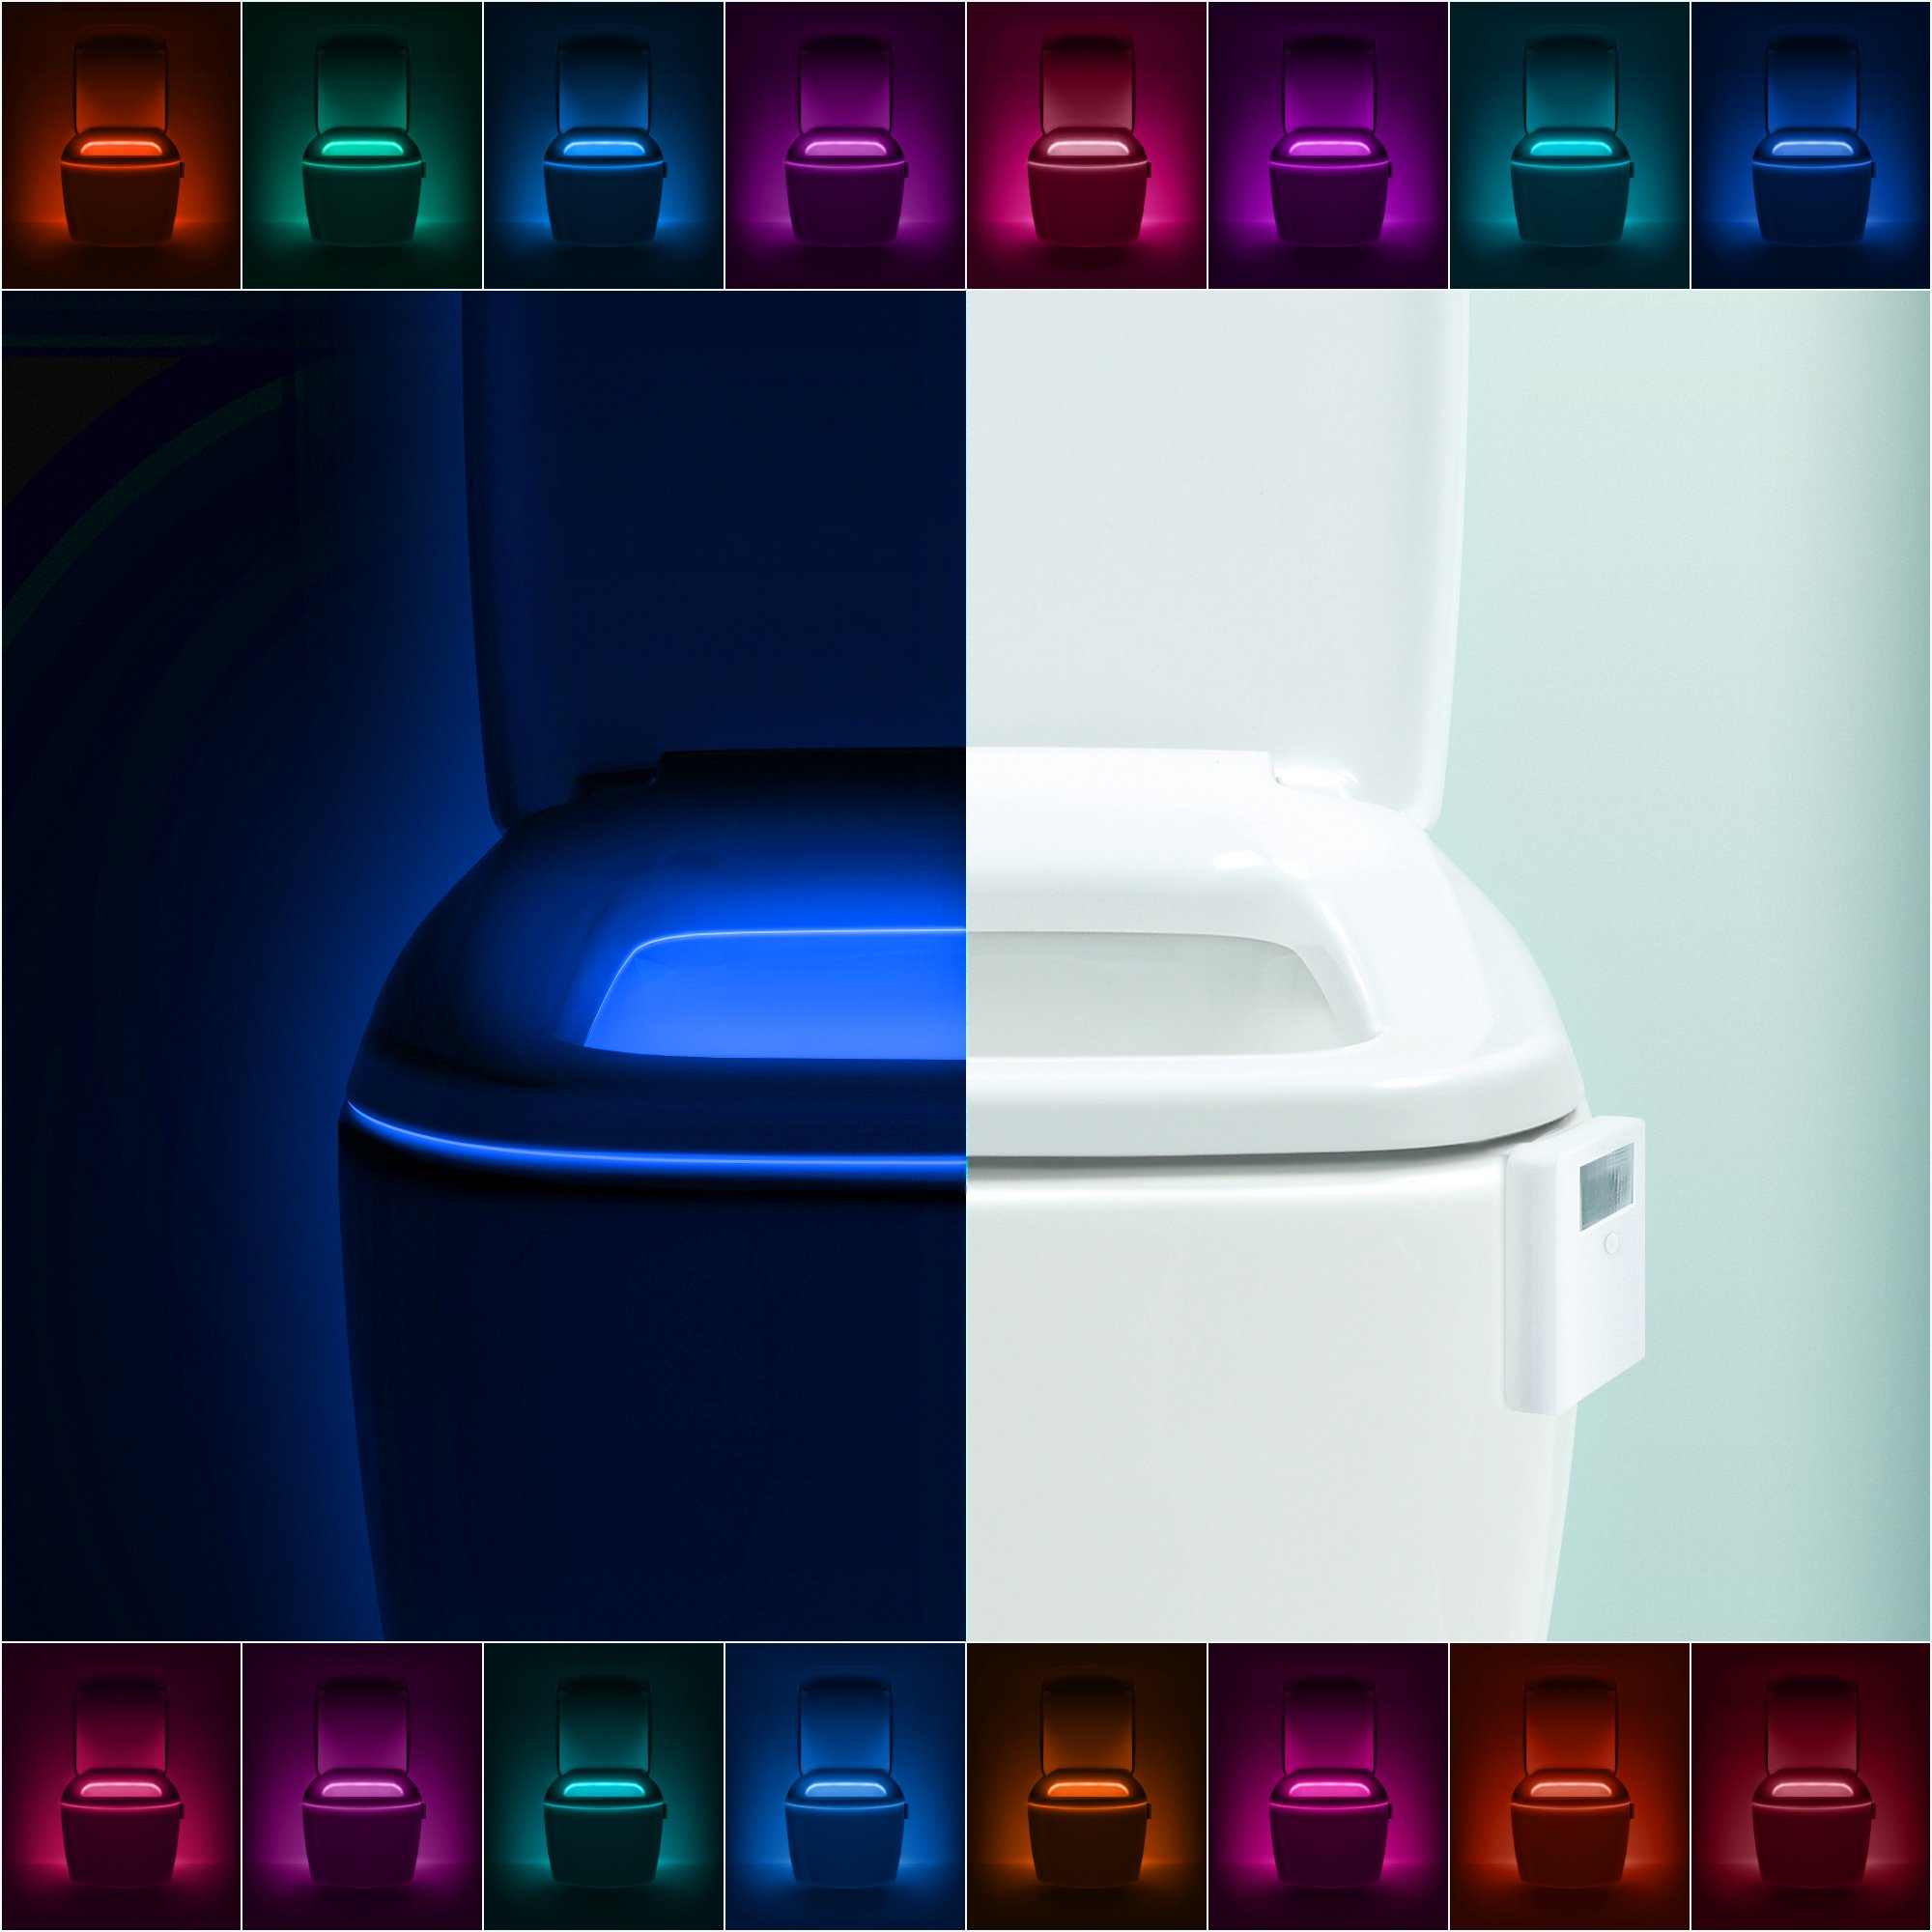 LumiLux Advanced 16-Color Motion Sensor LED Toilet Bowl Night Light, Internal Memory, Light Detection, White by LumiLux Toilet Light